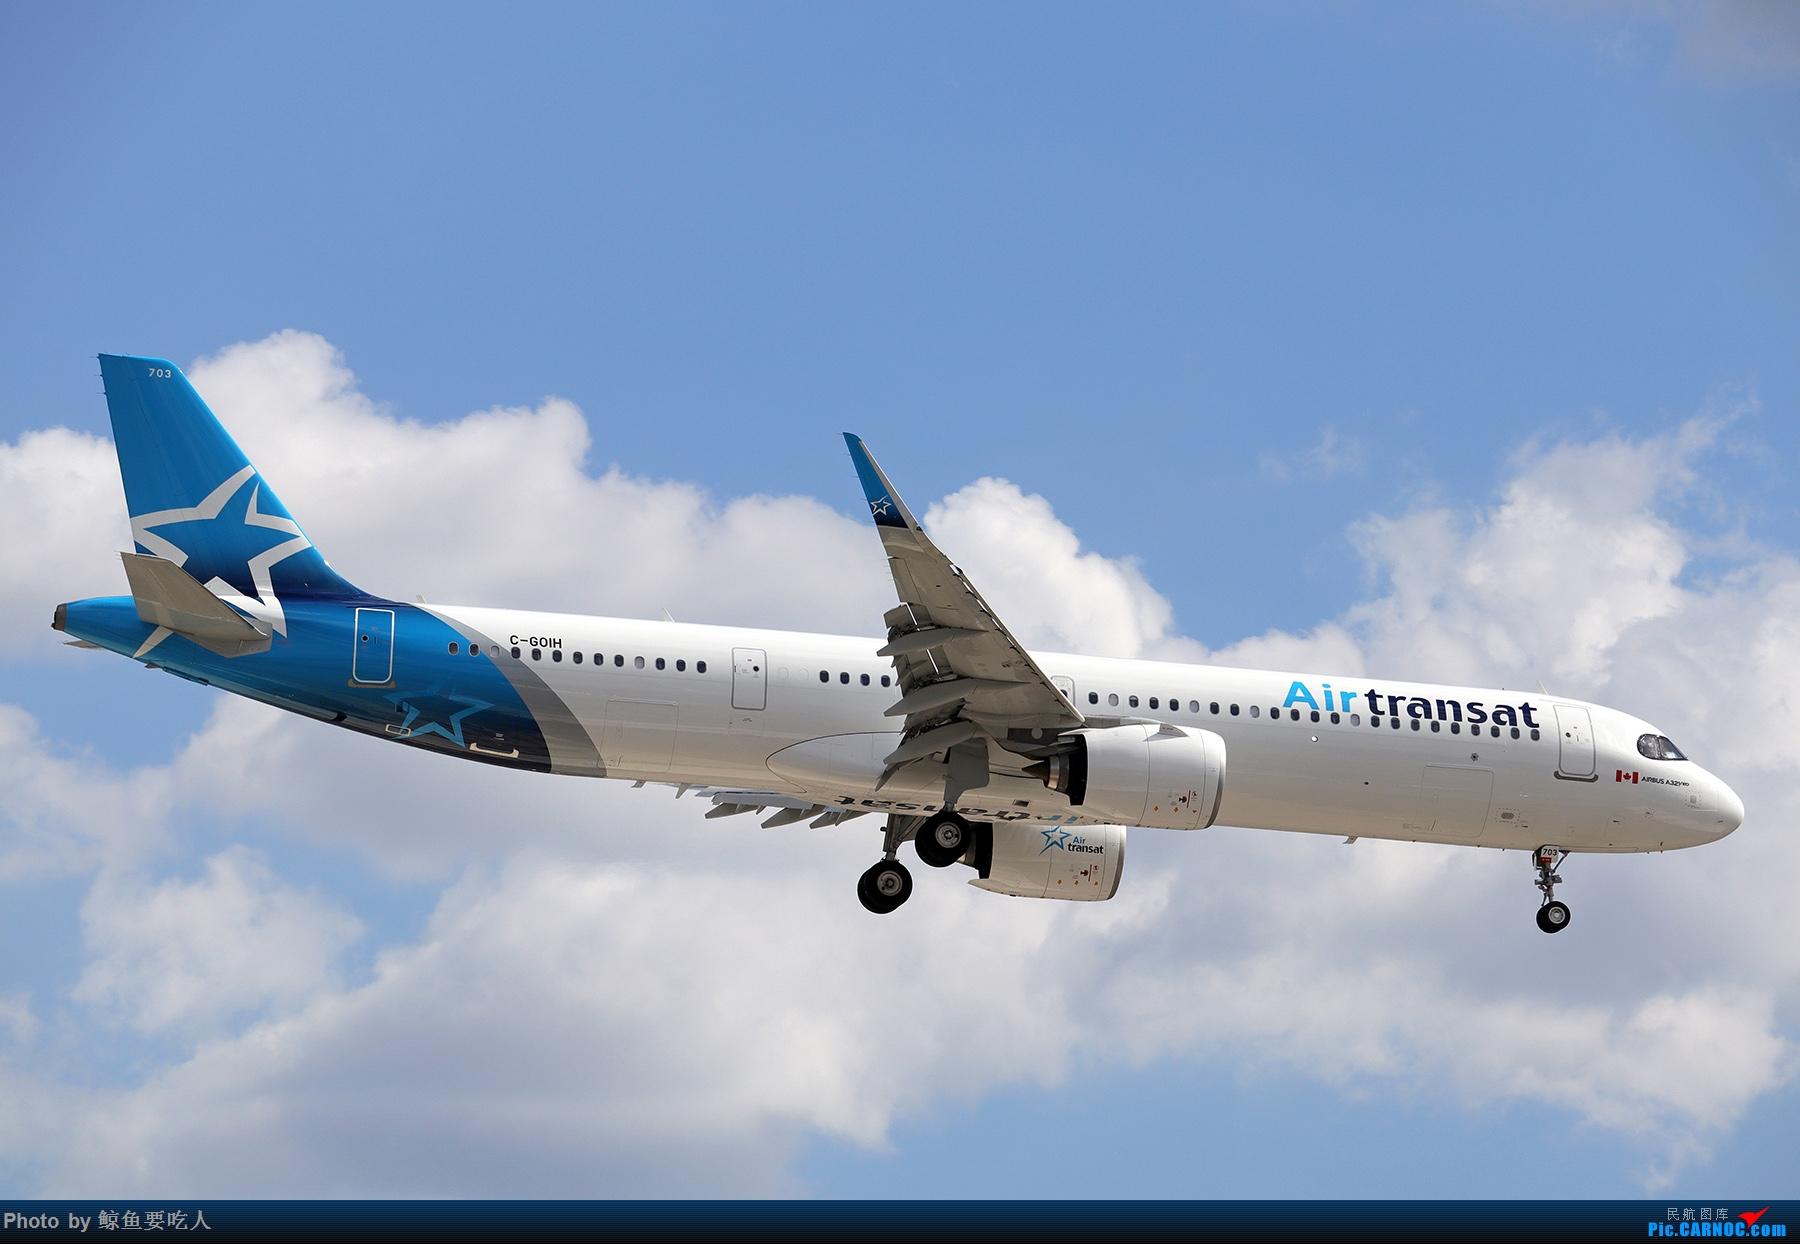 Re:[原创]【多图党】见证疫情后逐步的恢复,加拿大夏日多伦多皮尔逊机场拍机~ 乐见诸航空公司复航多伦多 AIRBUS A321NEO C-GOIH 多伦多皮尔逊国际机场